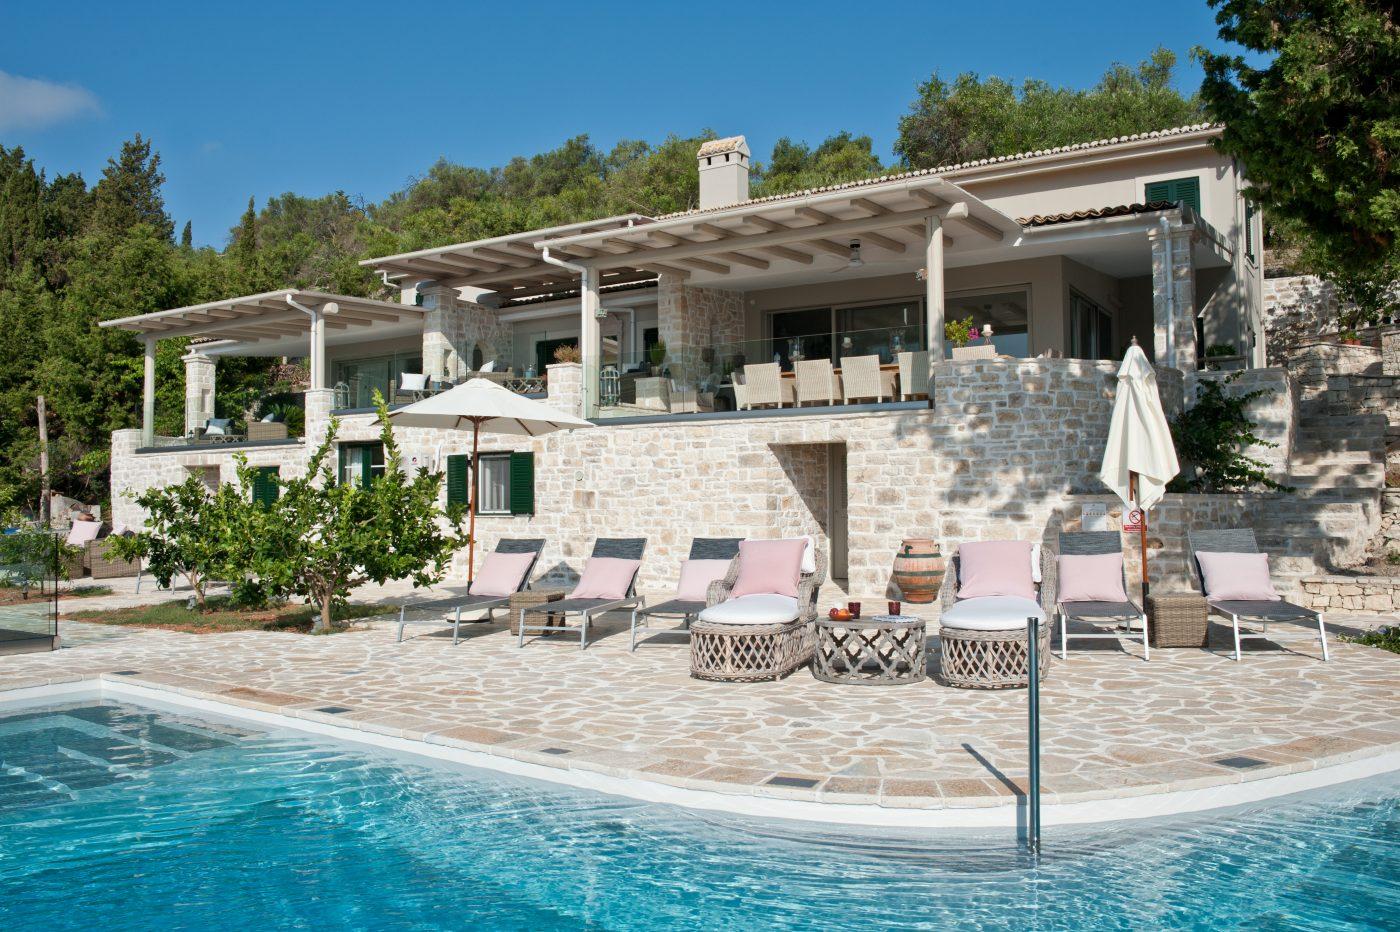 Kipos Beach House A Stunning Villa In Paxos Greece To